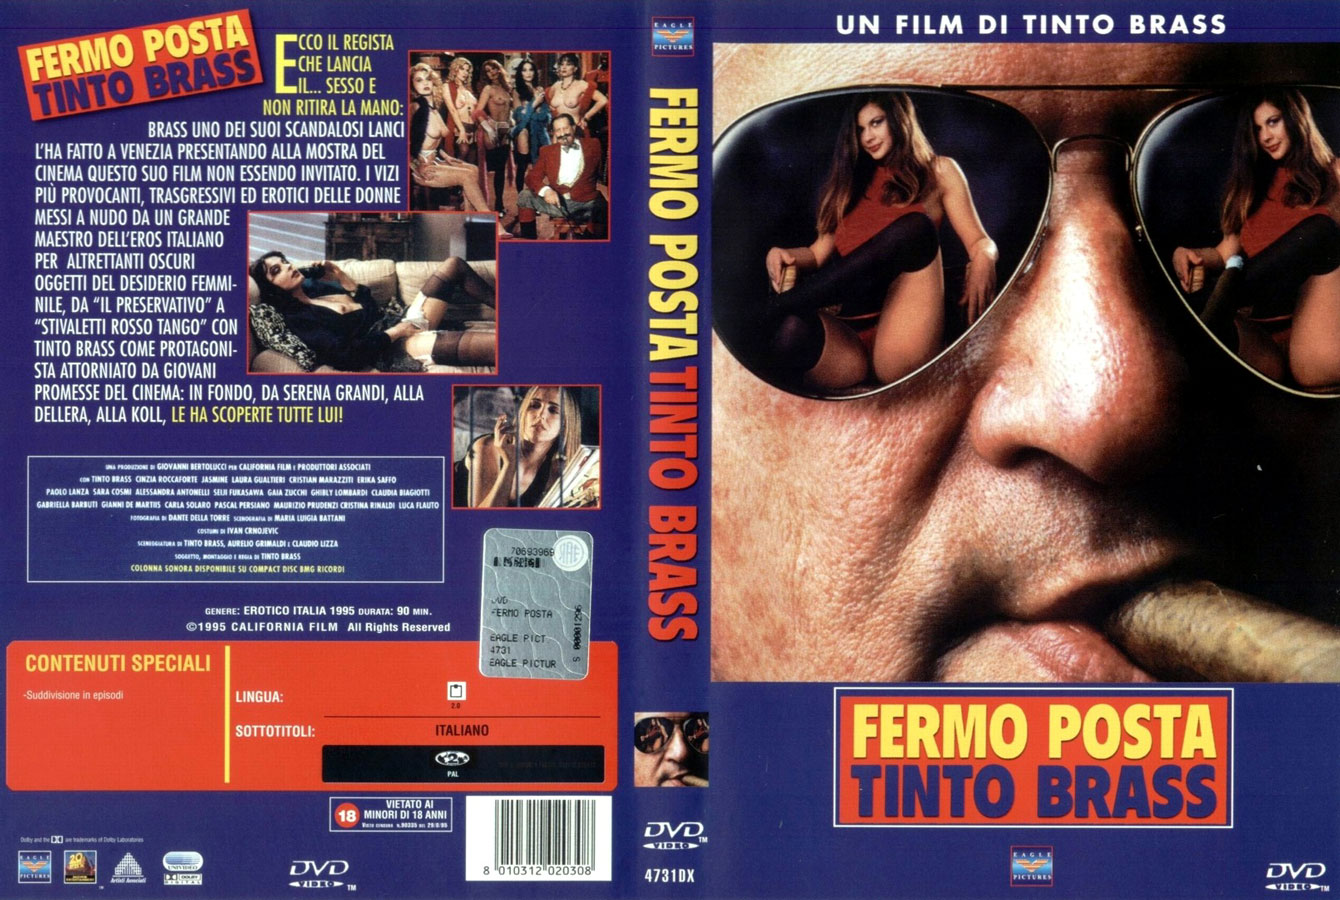 Po box tinto brass 1995 remastered - 4 5